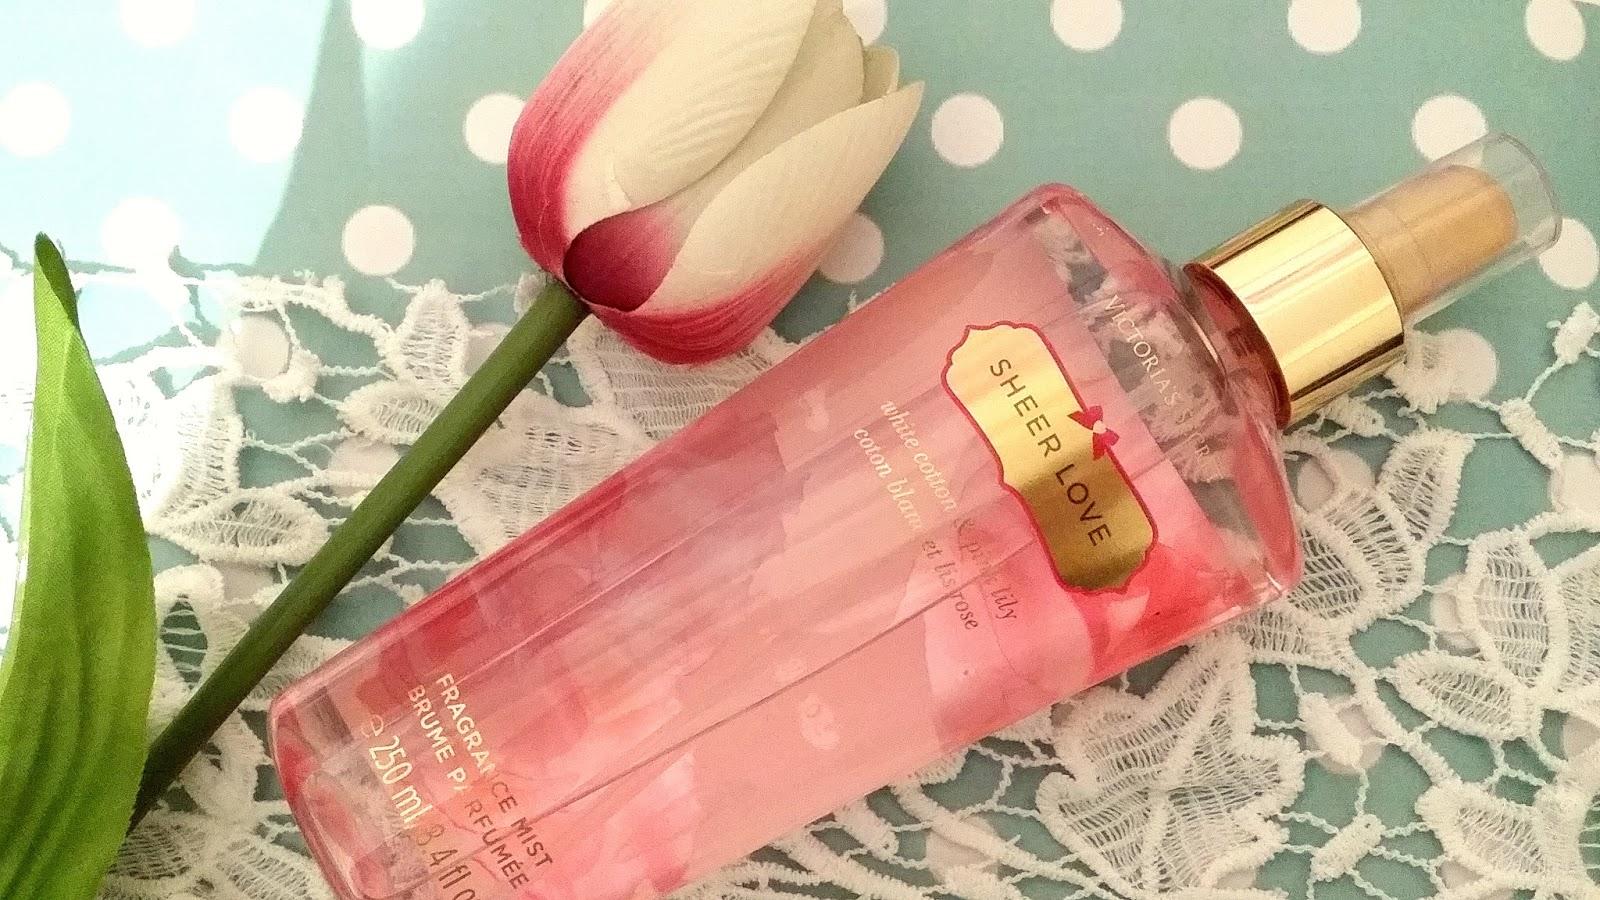 2bae8b5066 Victoria s Secret Sheer Love Body Mist - Pink Daisy Loves